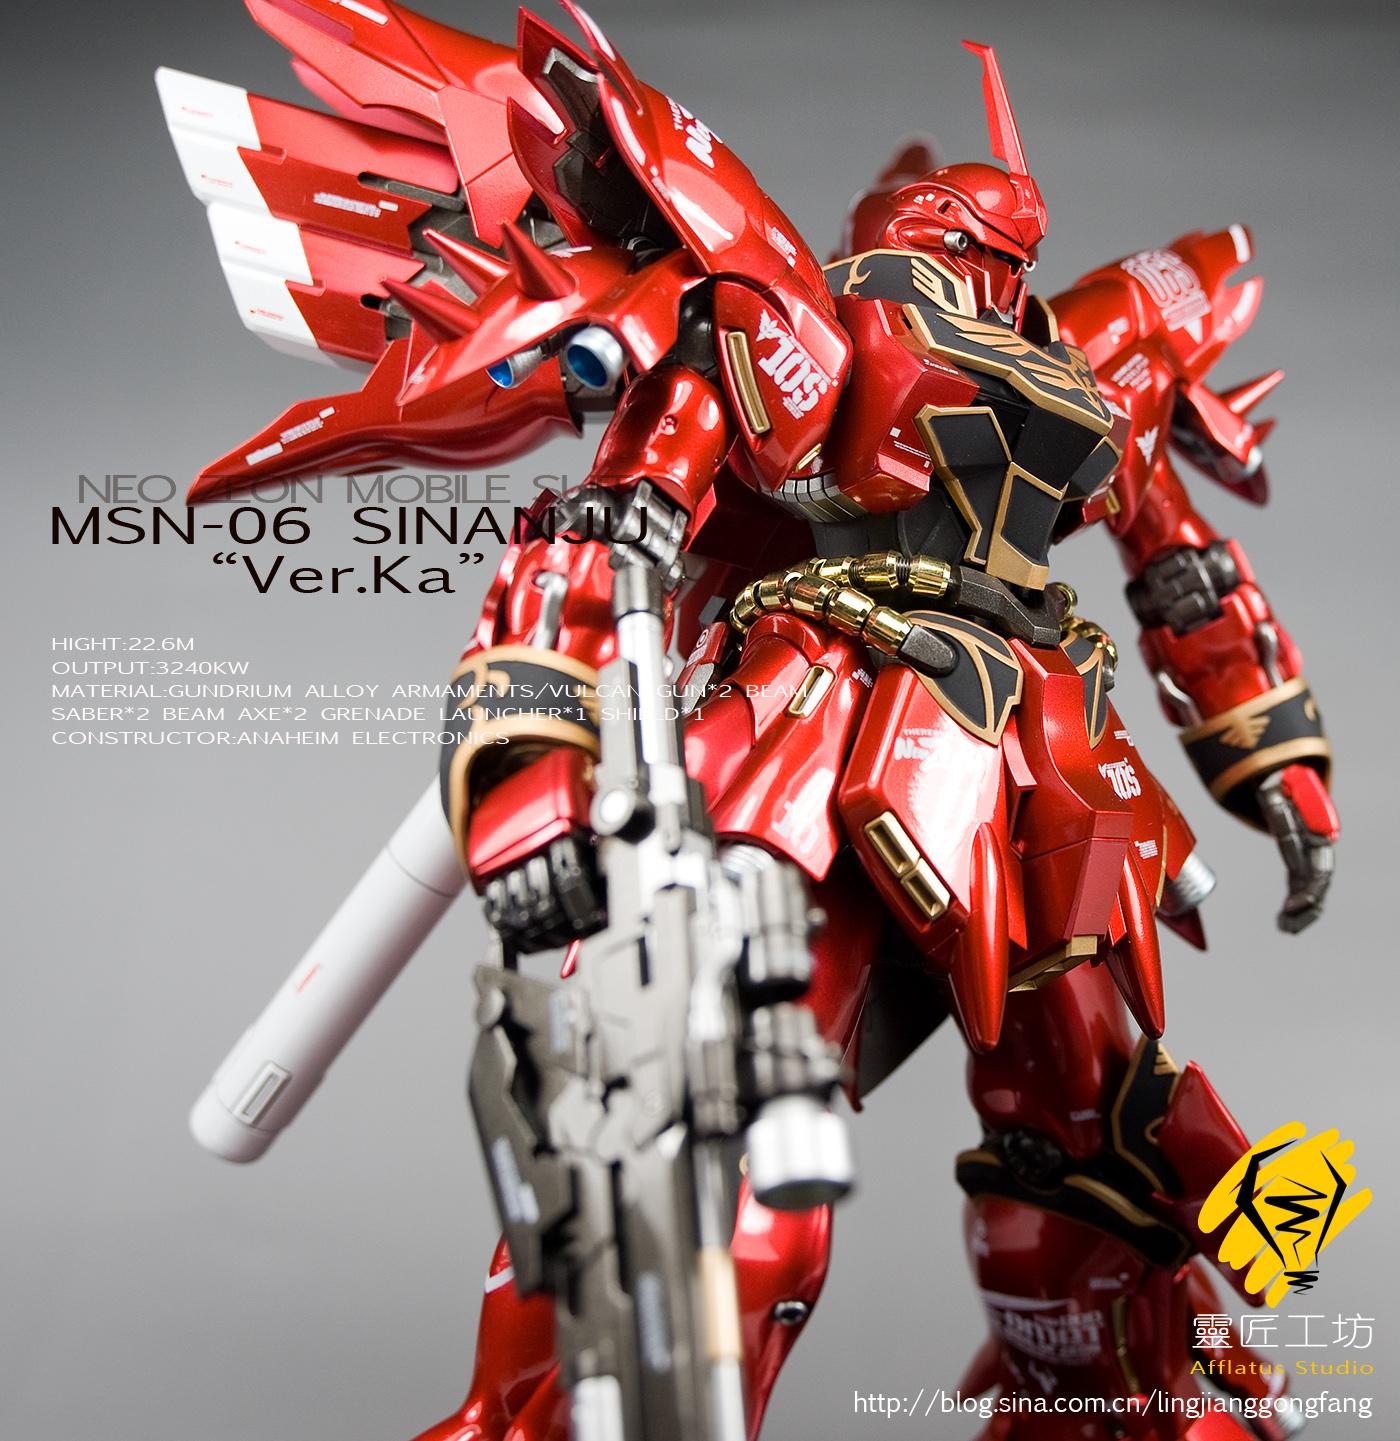 MG 1/100 MSN-06 Sinanju Ver. Ka | patrickgrade